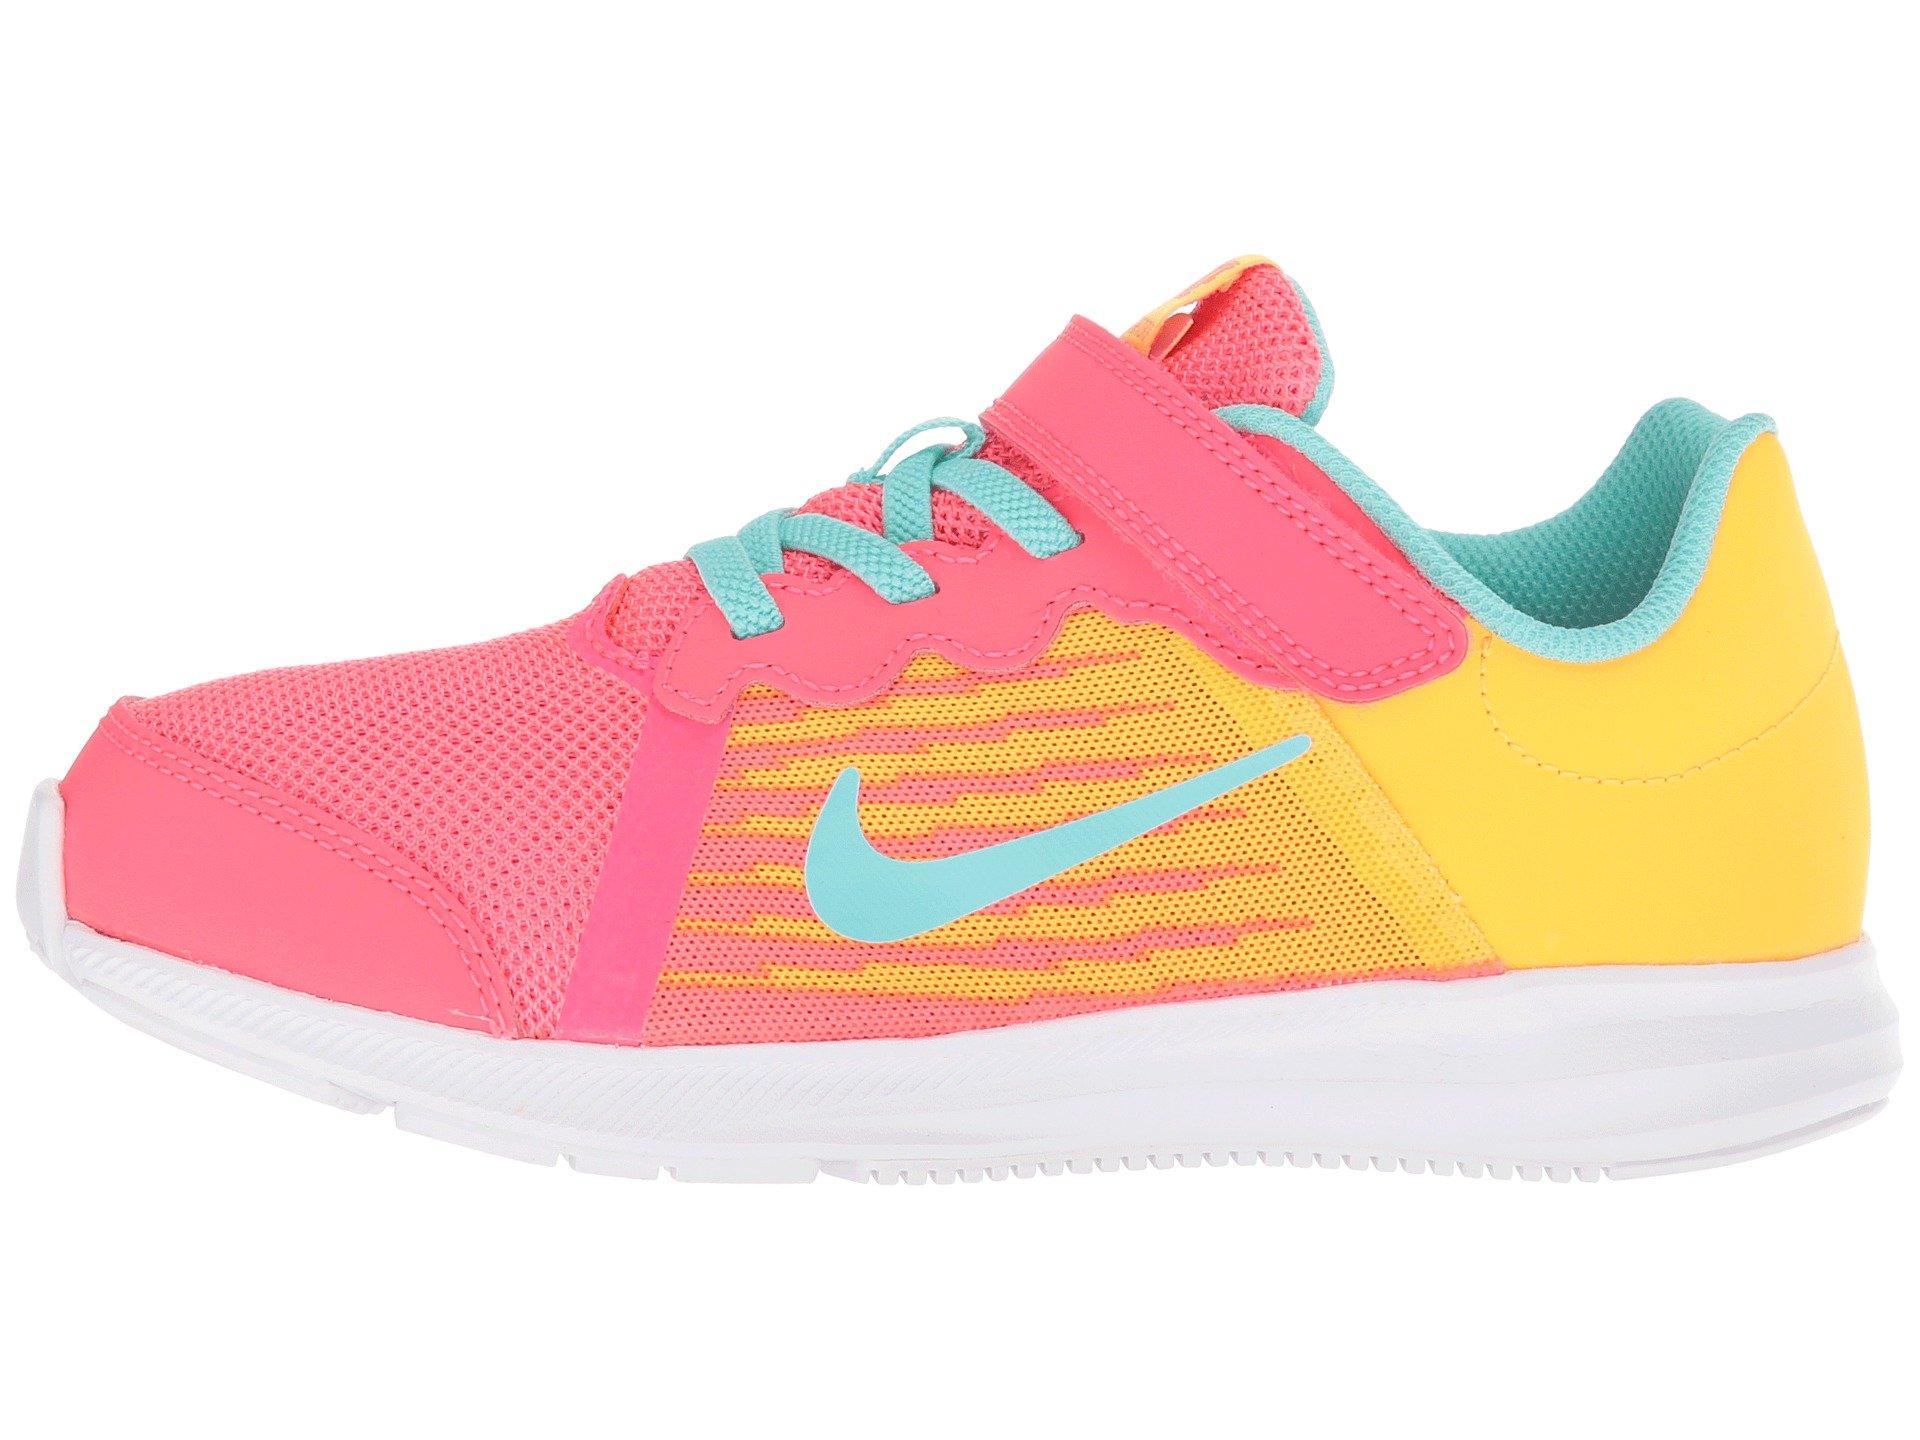 Nike Kids' Preschool Downshifter 8 Fade Running Shoes (1.5, Red/Green) by Nike (Image #6)